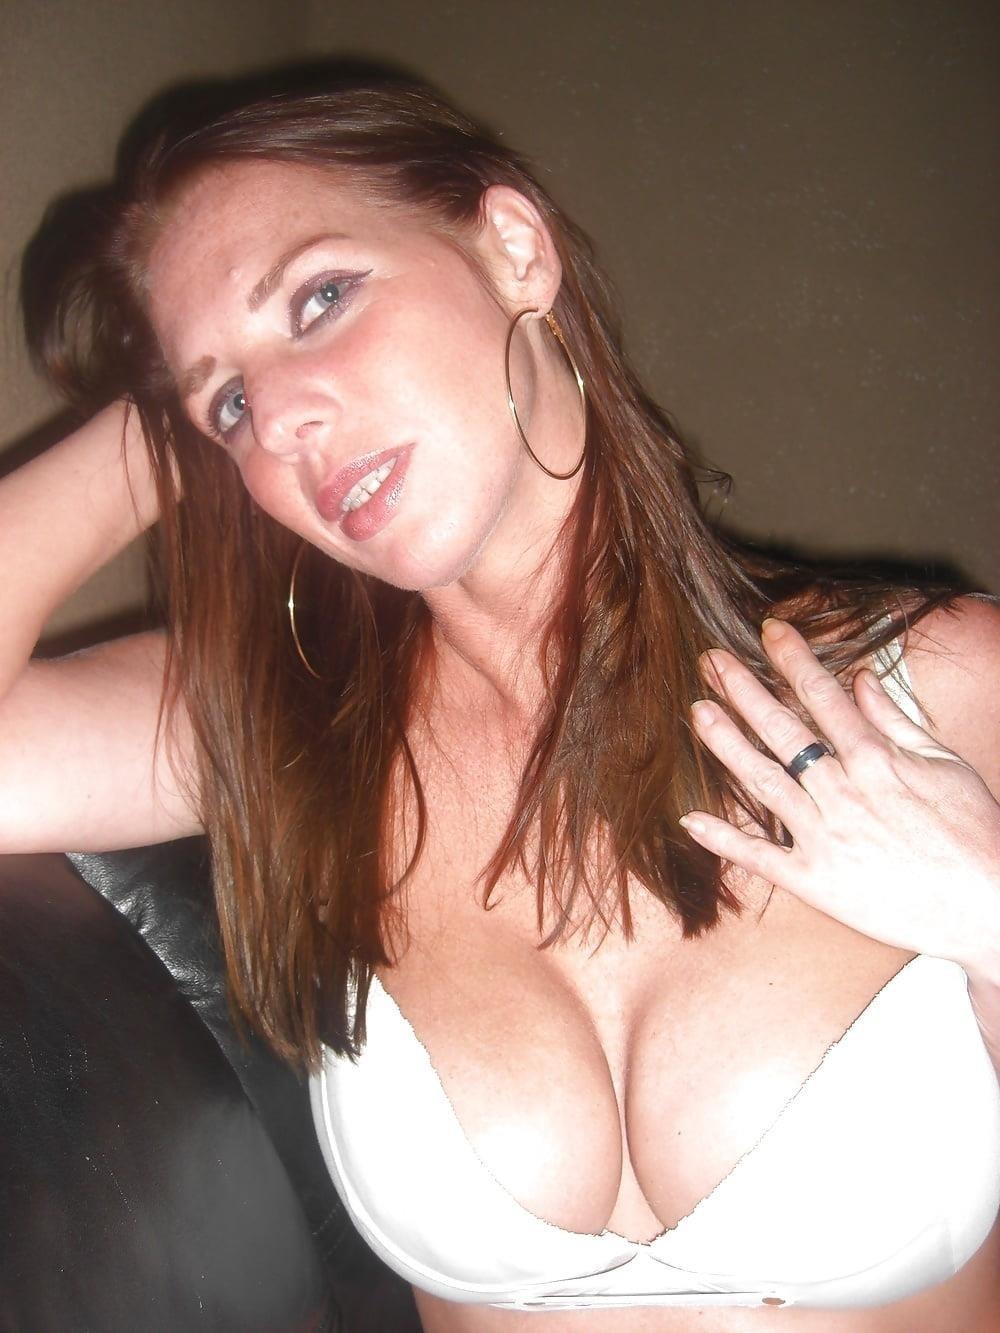 Big tit brunette pics-7433